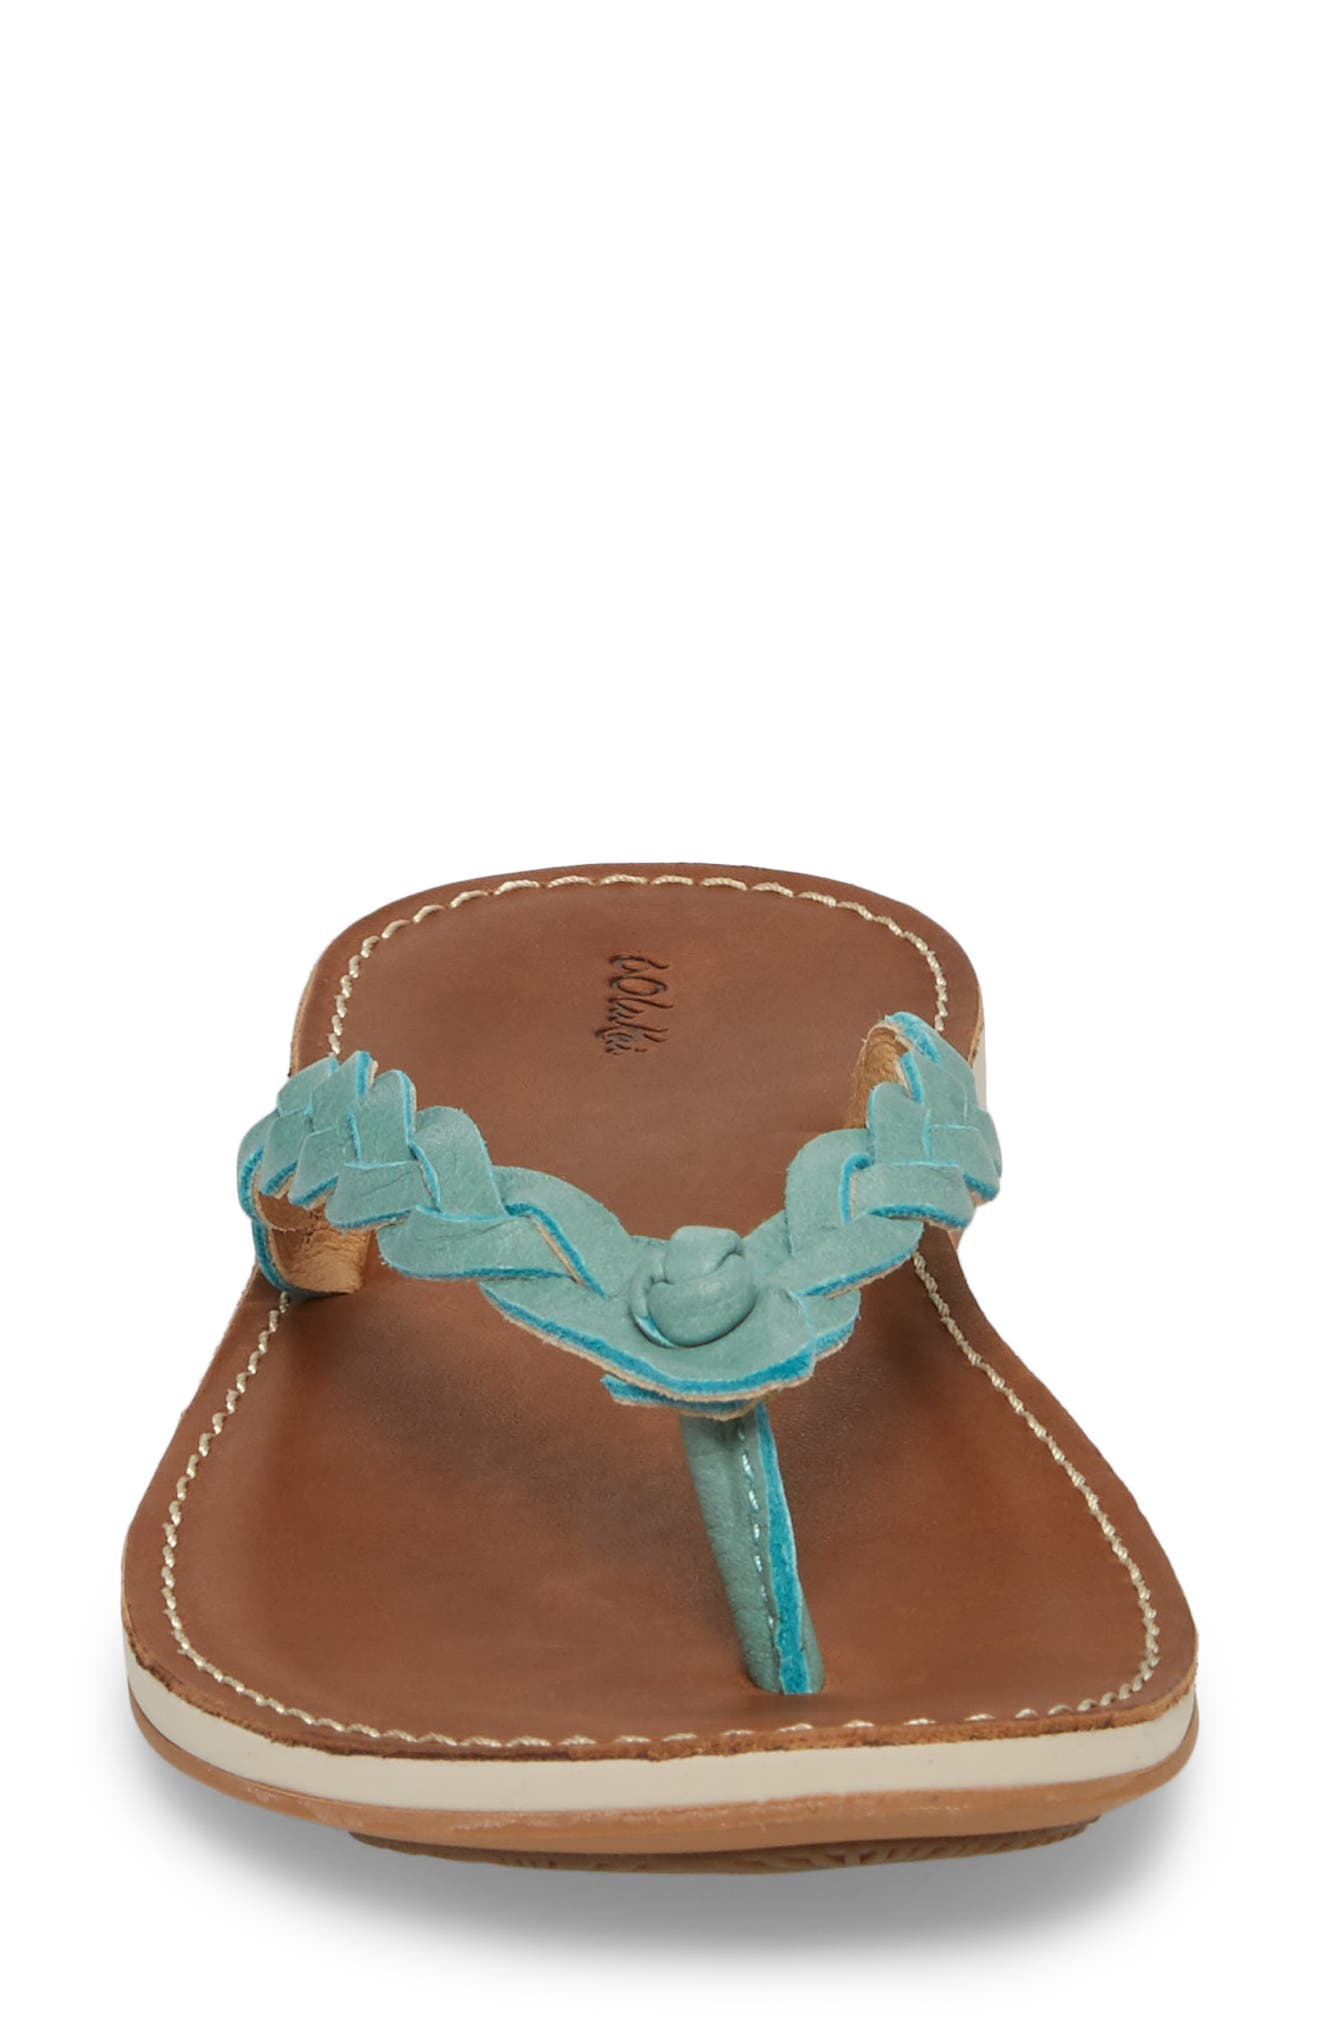 Kahiko Flip-Flop,                             Alternate thumbnail 4, color,                             Sea/ Tan Leather